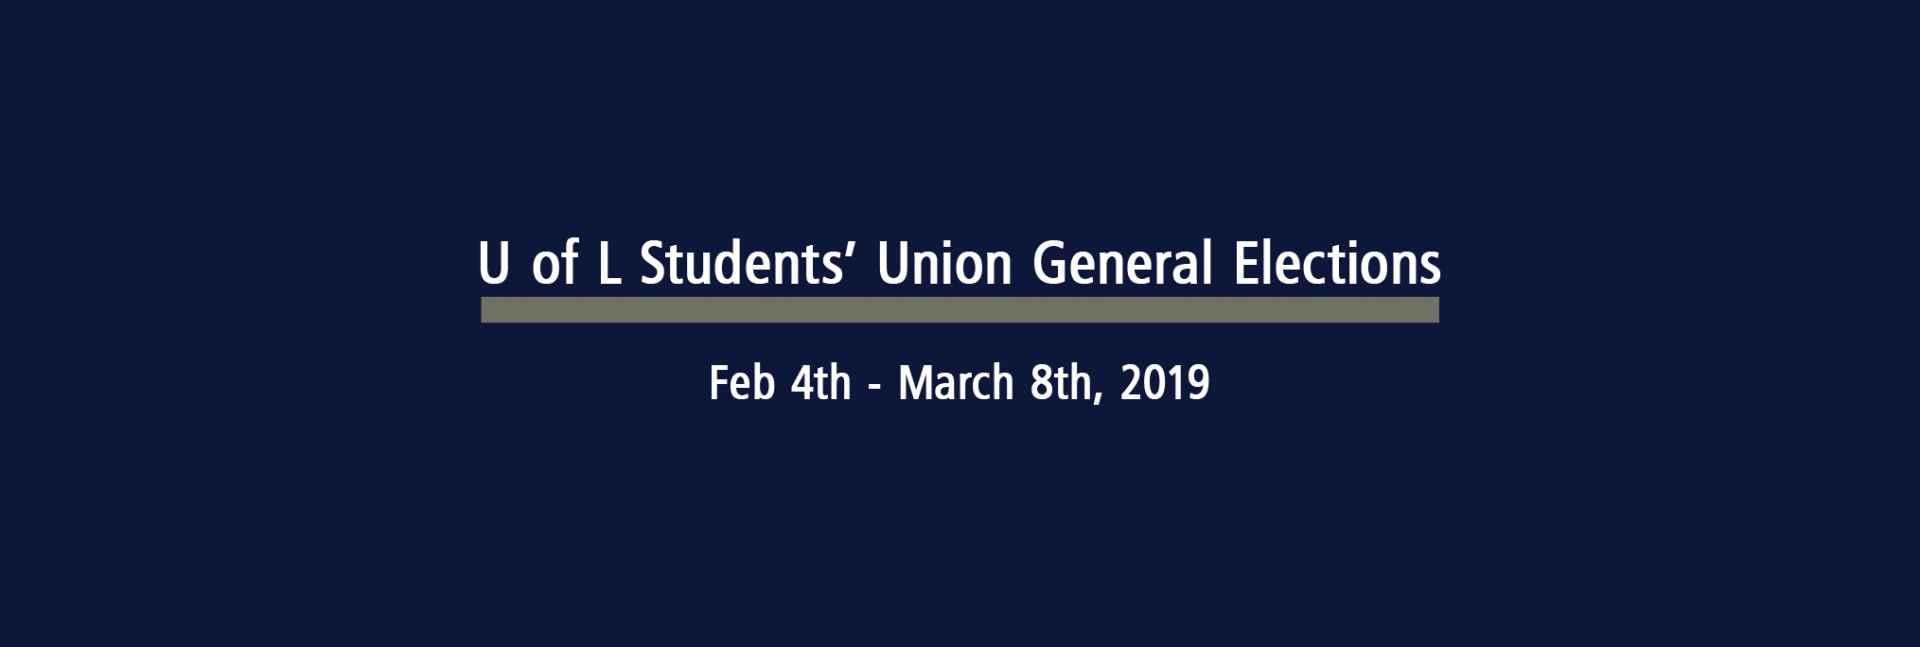 ULSU General Elections 2019